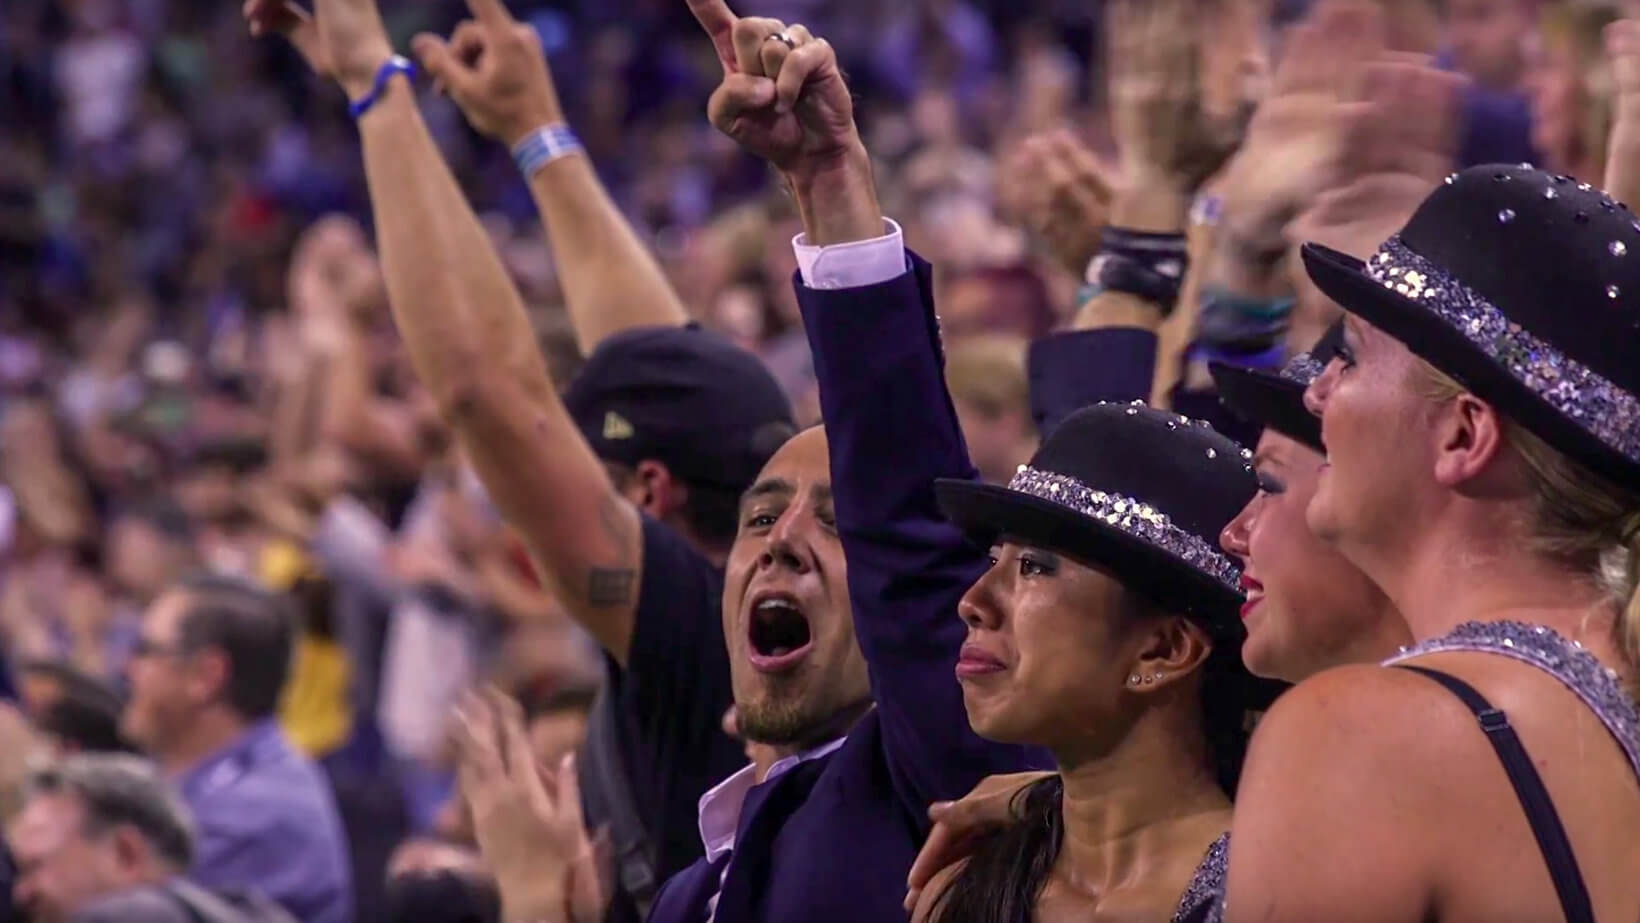 Drum corps' biggest cheerleaders